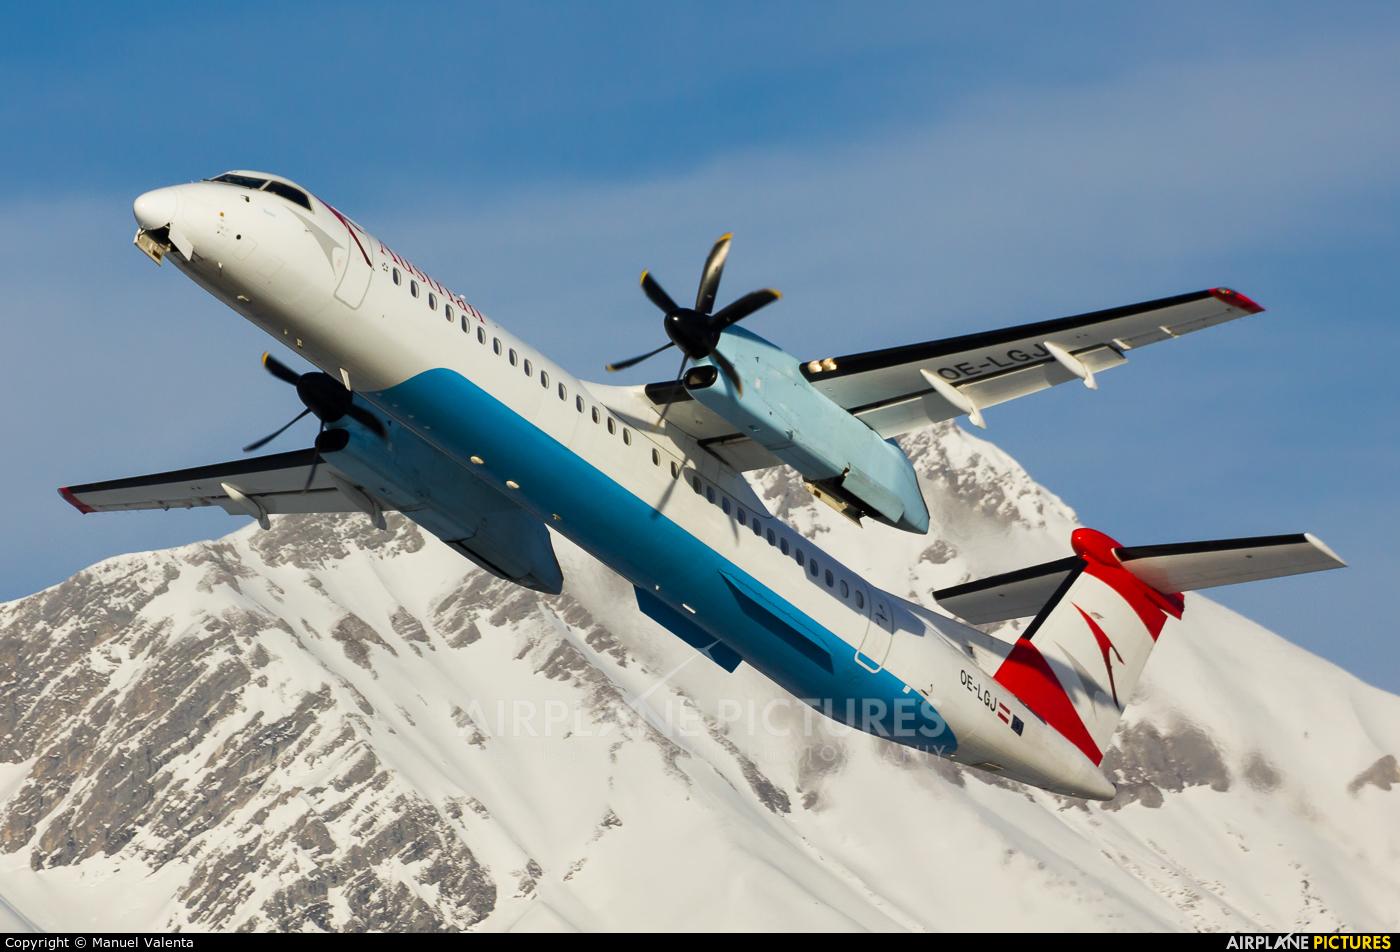 Austrian Airlines/Arrows/Tyrolean OE-LGJ aircraft at Innsbruck